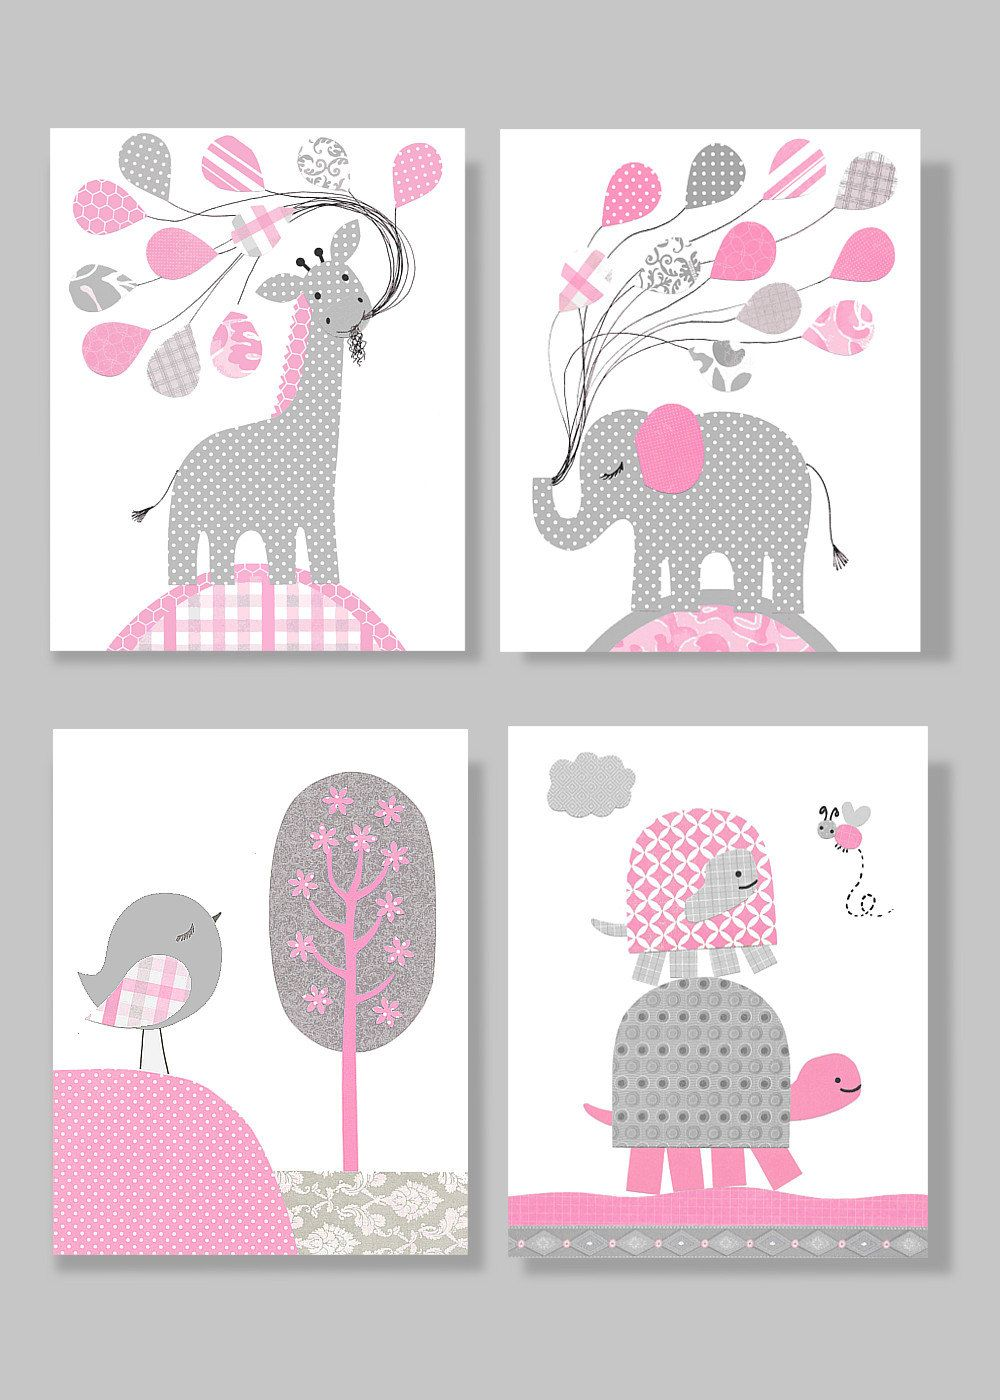 Elephant nursery wall art print mom baby dad by rizzleandrugee - Pink And Grey Nursery Baby Girl Nursery Girl Nursery Art Elephant Nursery Baby Art Prints Giraffe Nursery Bird Wall Decor Set Of 4